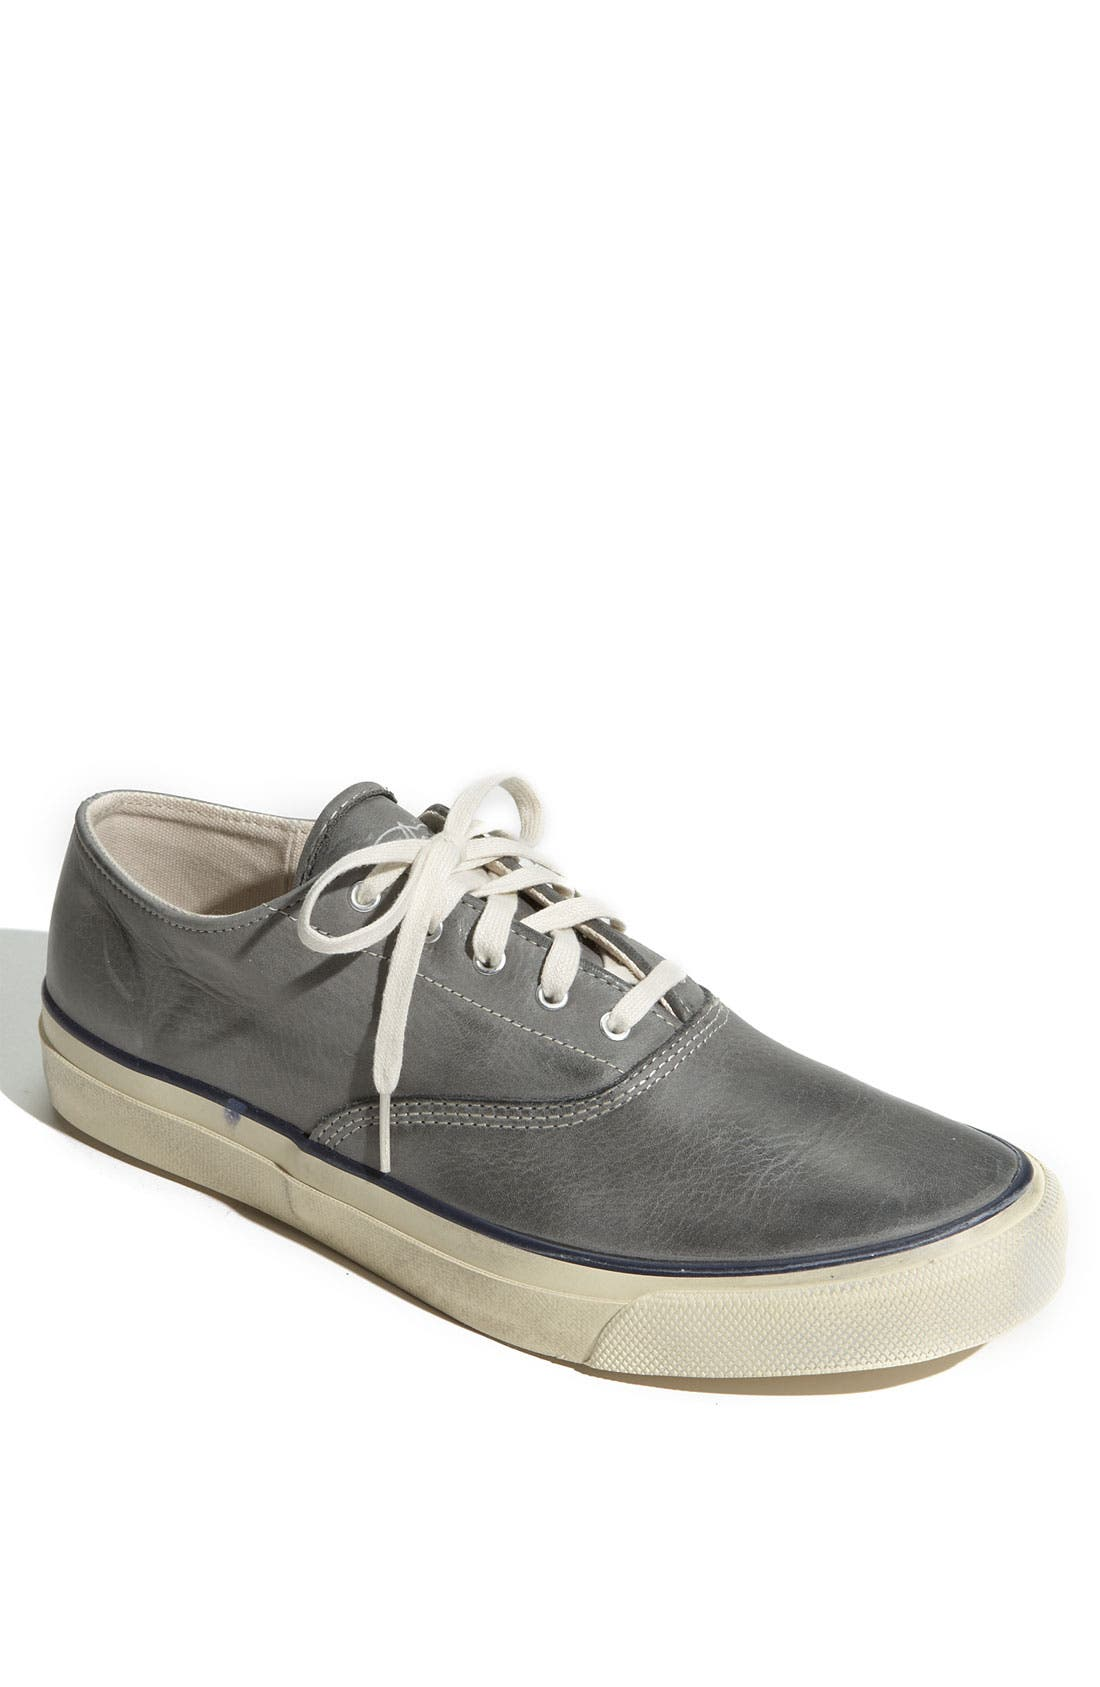 Alternate Image 1 Selected - Sperry Top-Sider® 'CVO' Burnished Sneaker